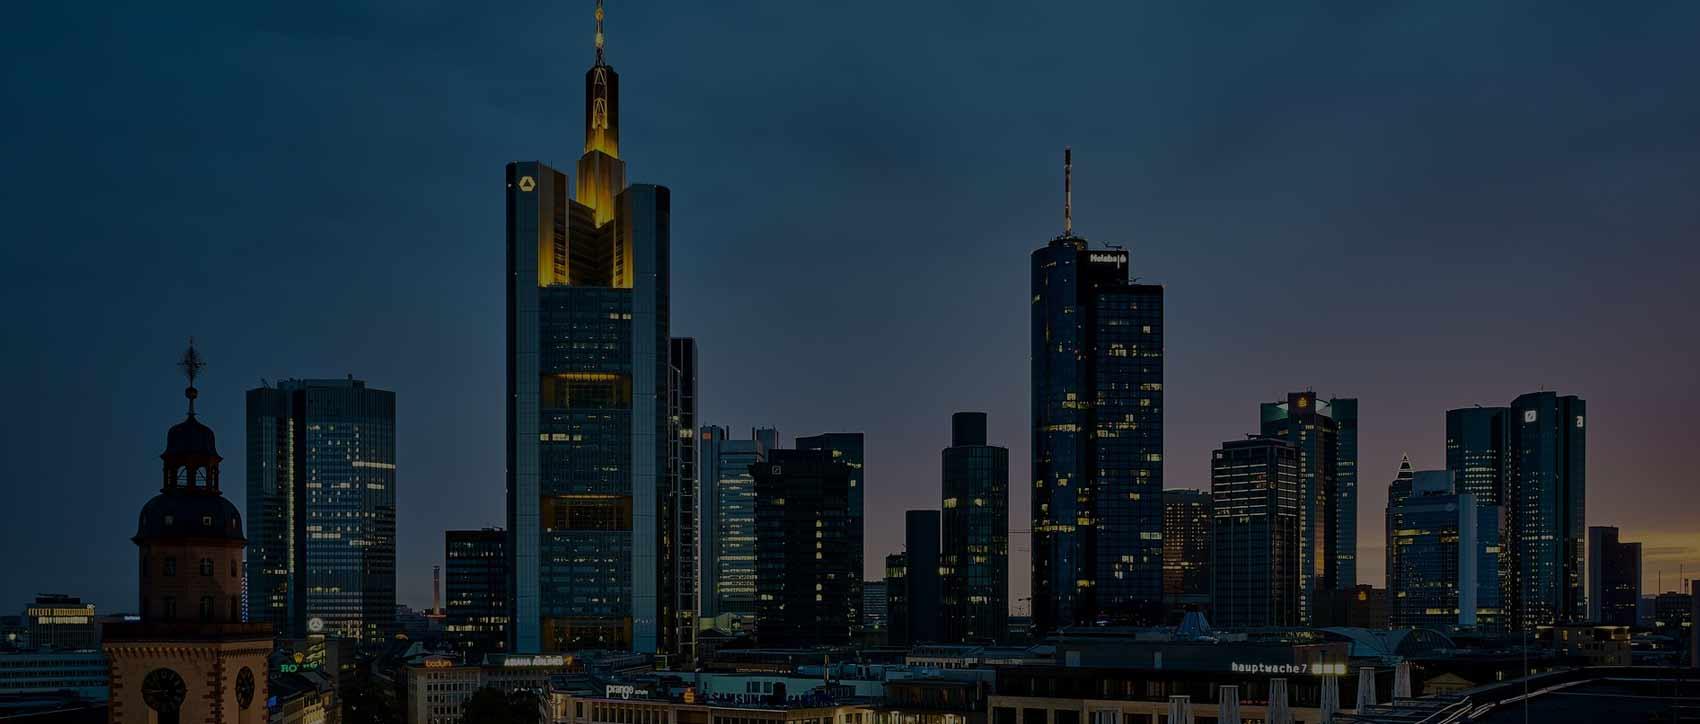 Autoankauf in Frankfurt